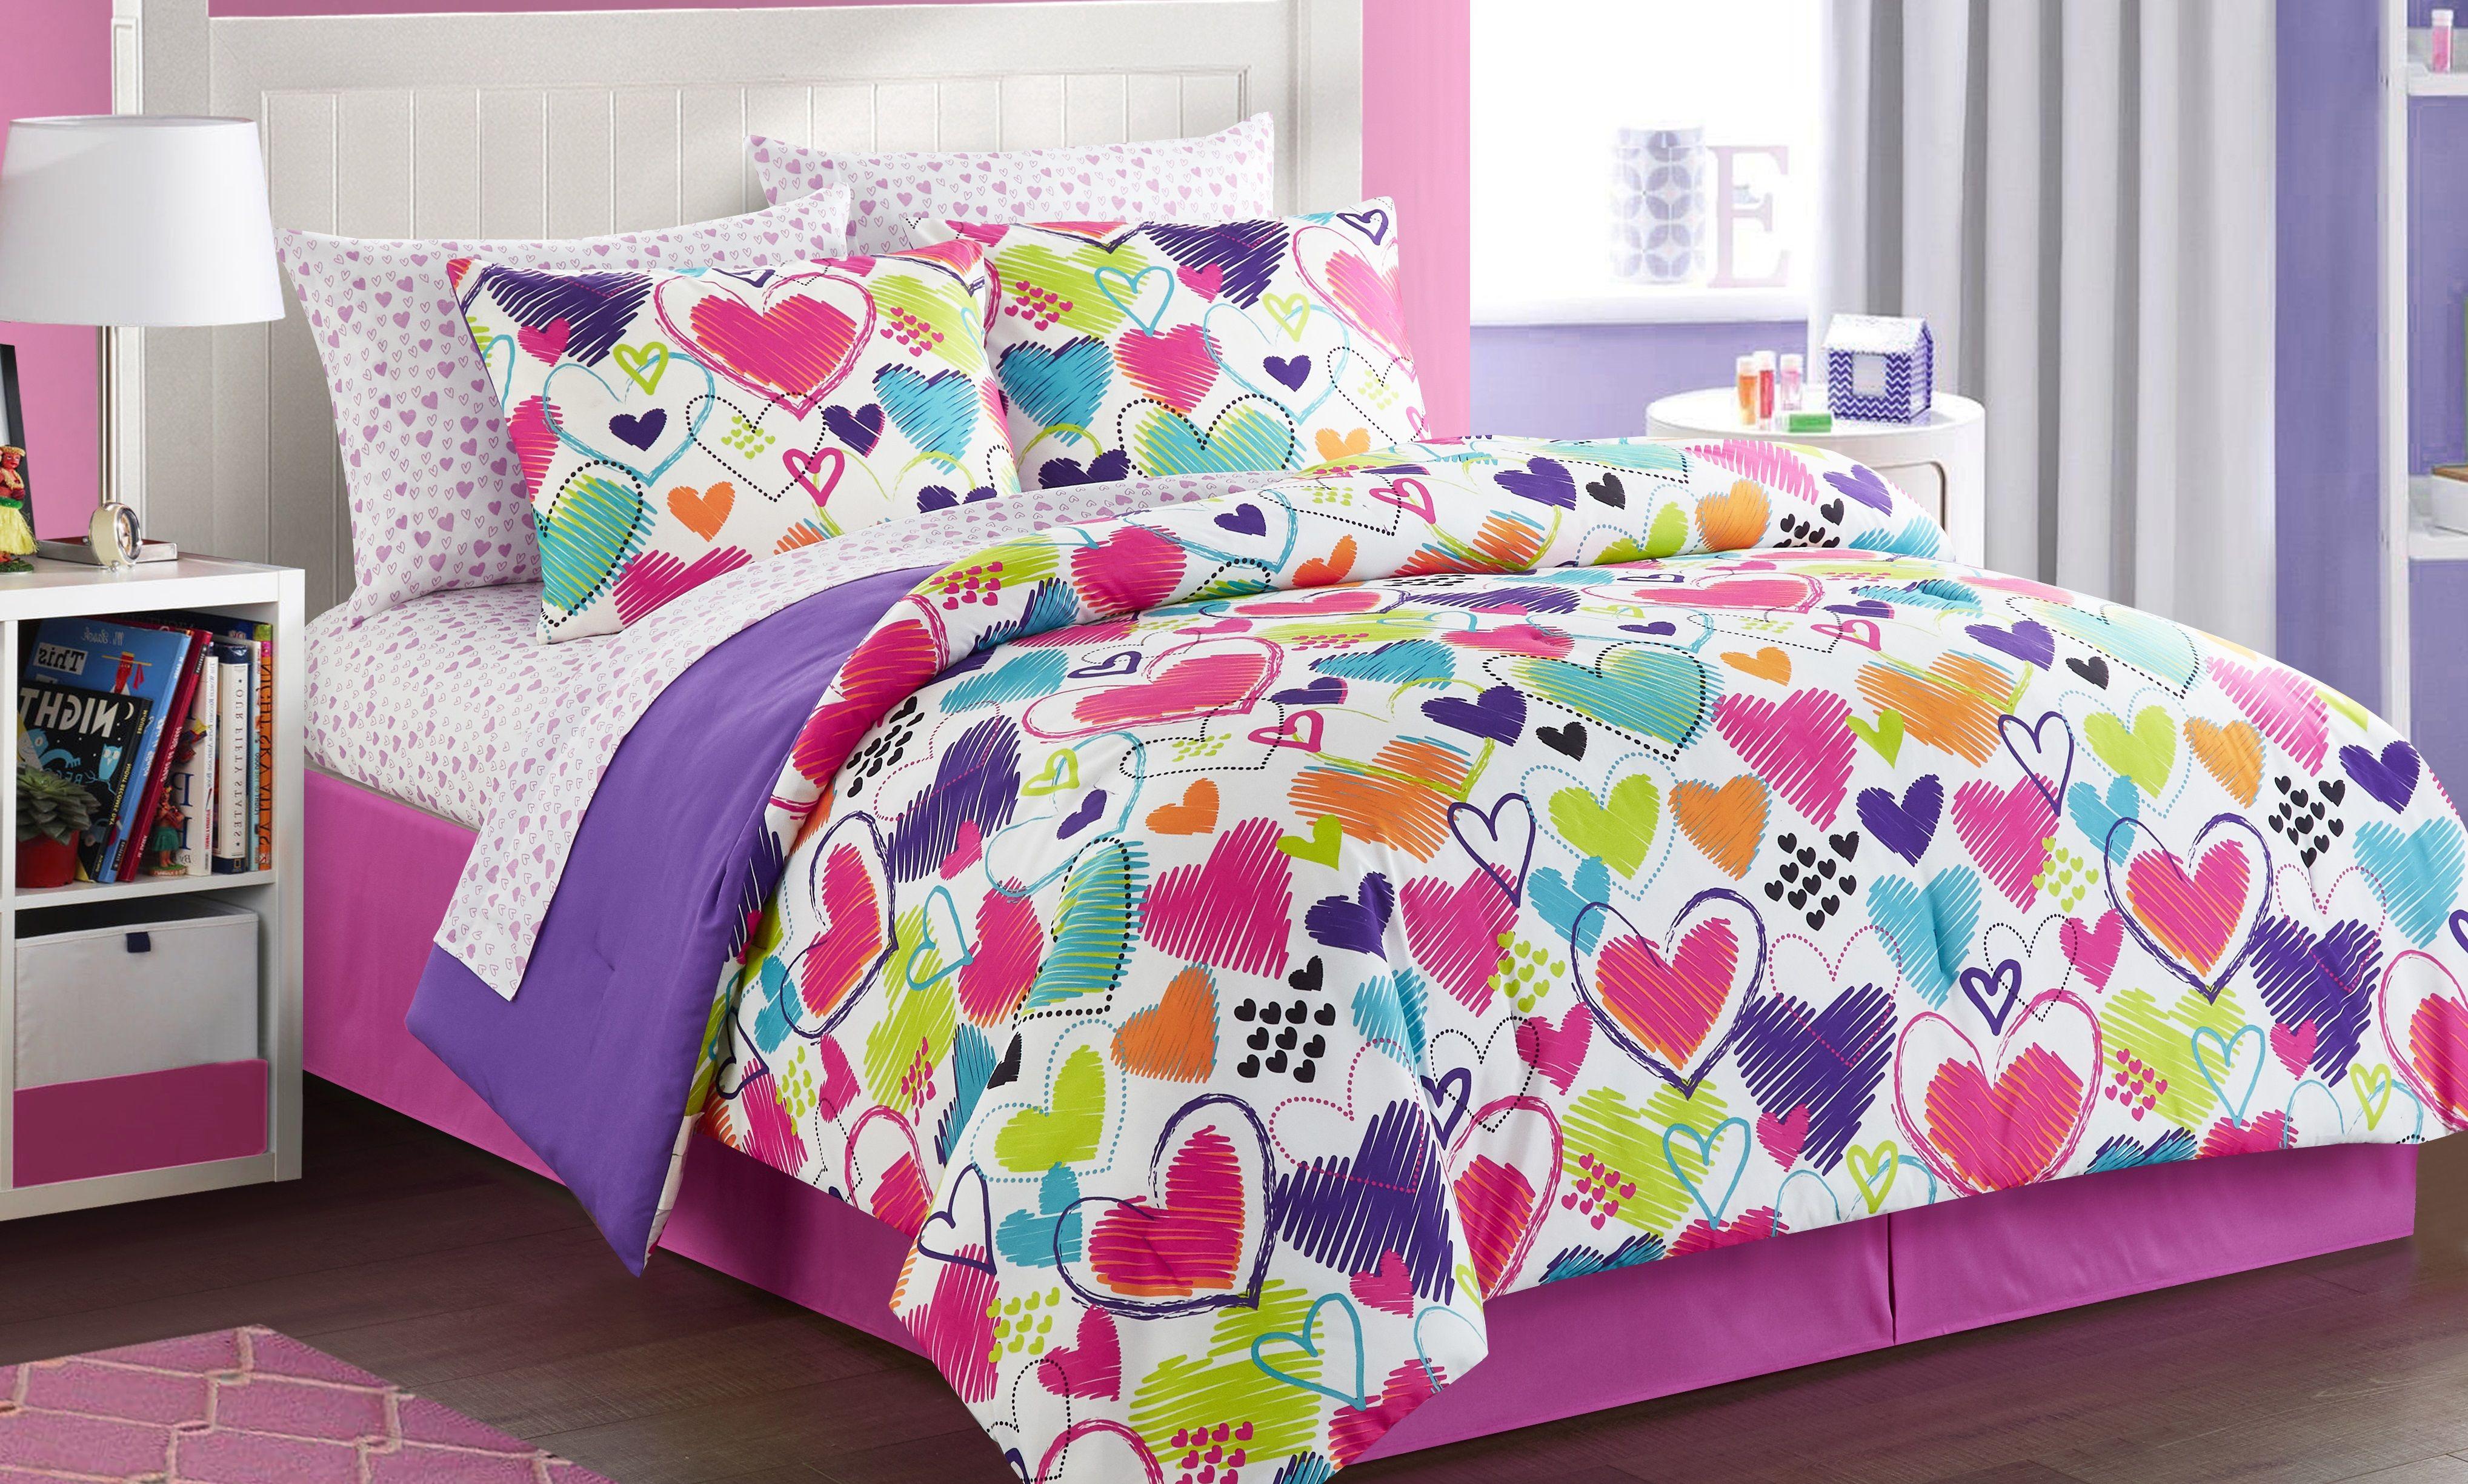 Latitude Bright Hearts Bed In A Bag Bedding Set Walmart Com